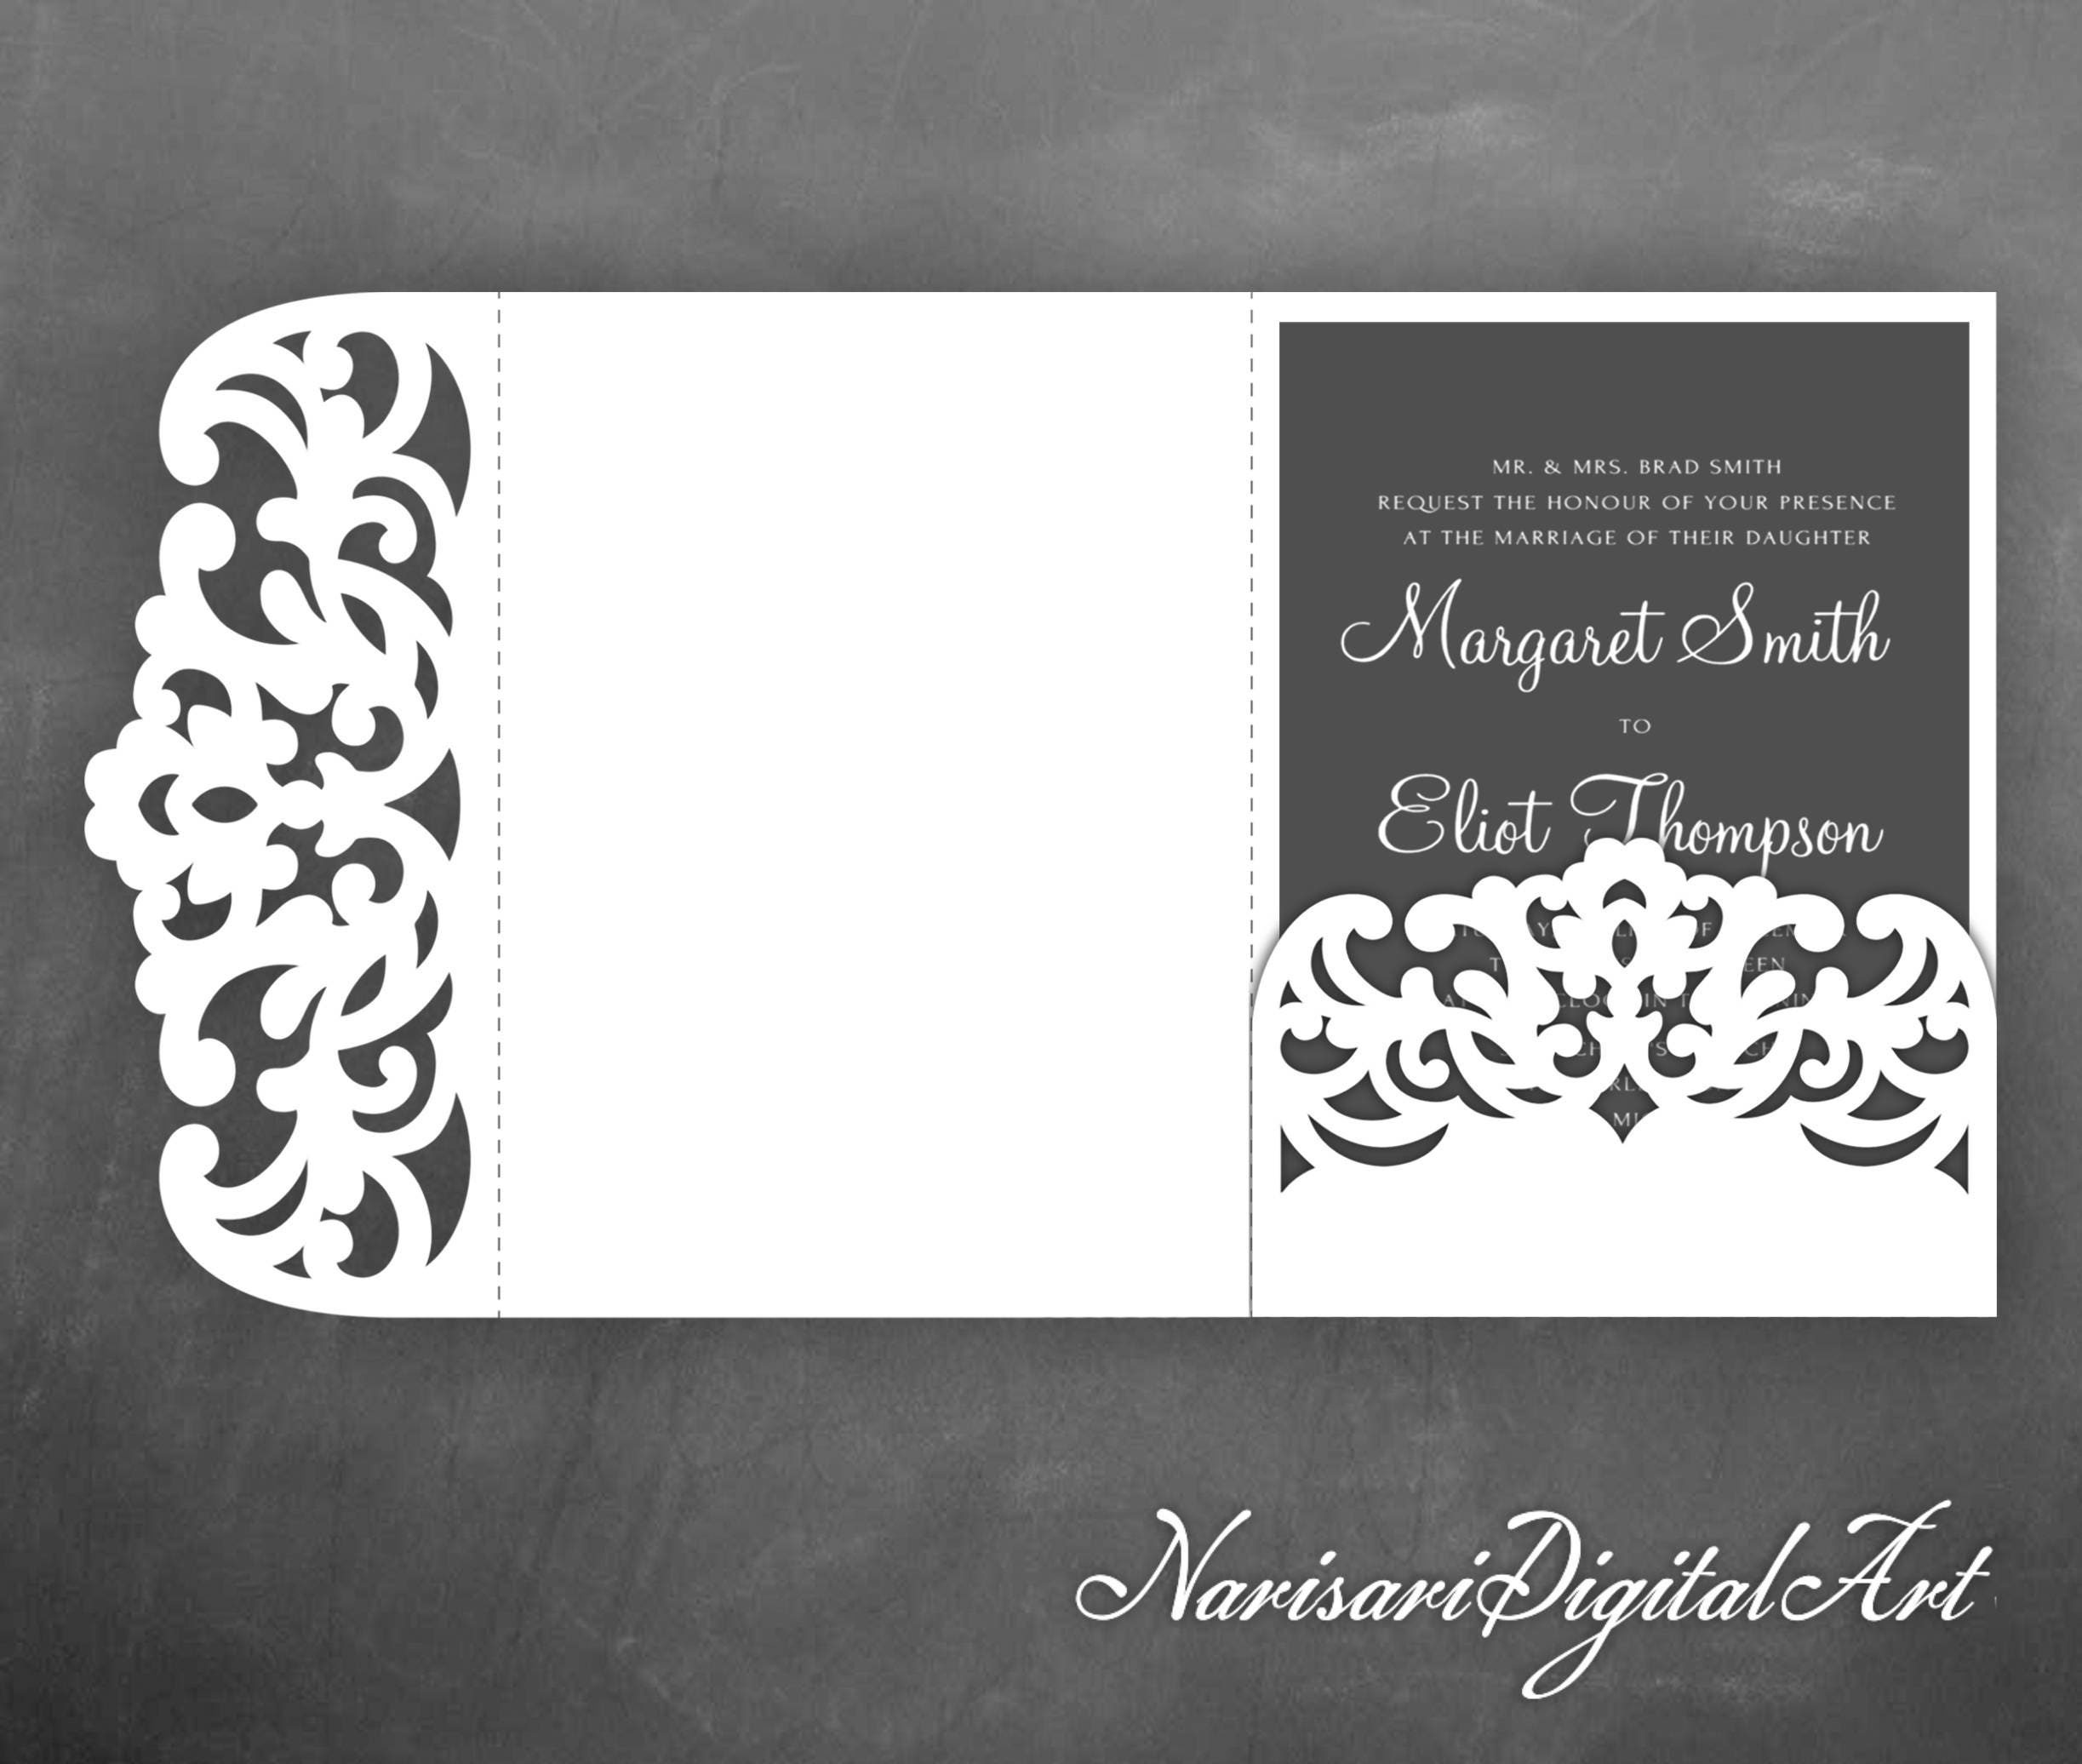 Tri-Fold pocket envelope 5x7 Wedding Invitation SVG Template | Etsy